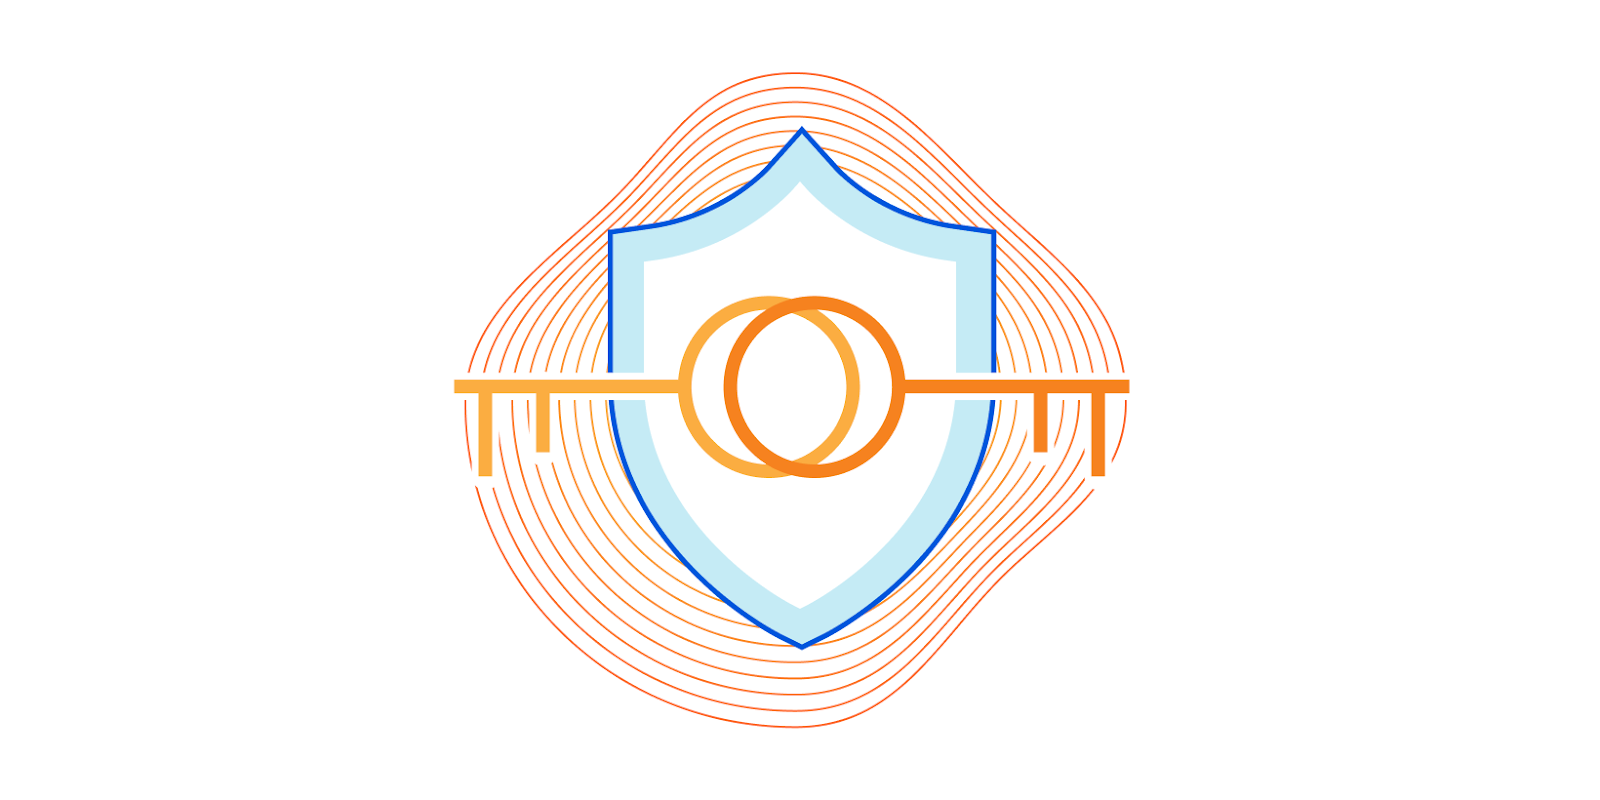 Encrypting your WAF Payloads with Hybrid Public Key Encryption (HPKE)